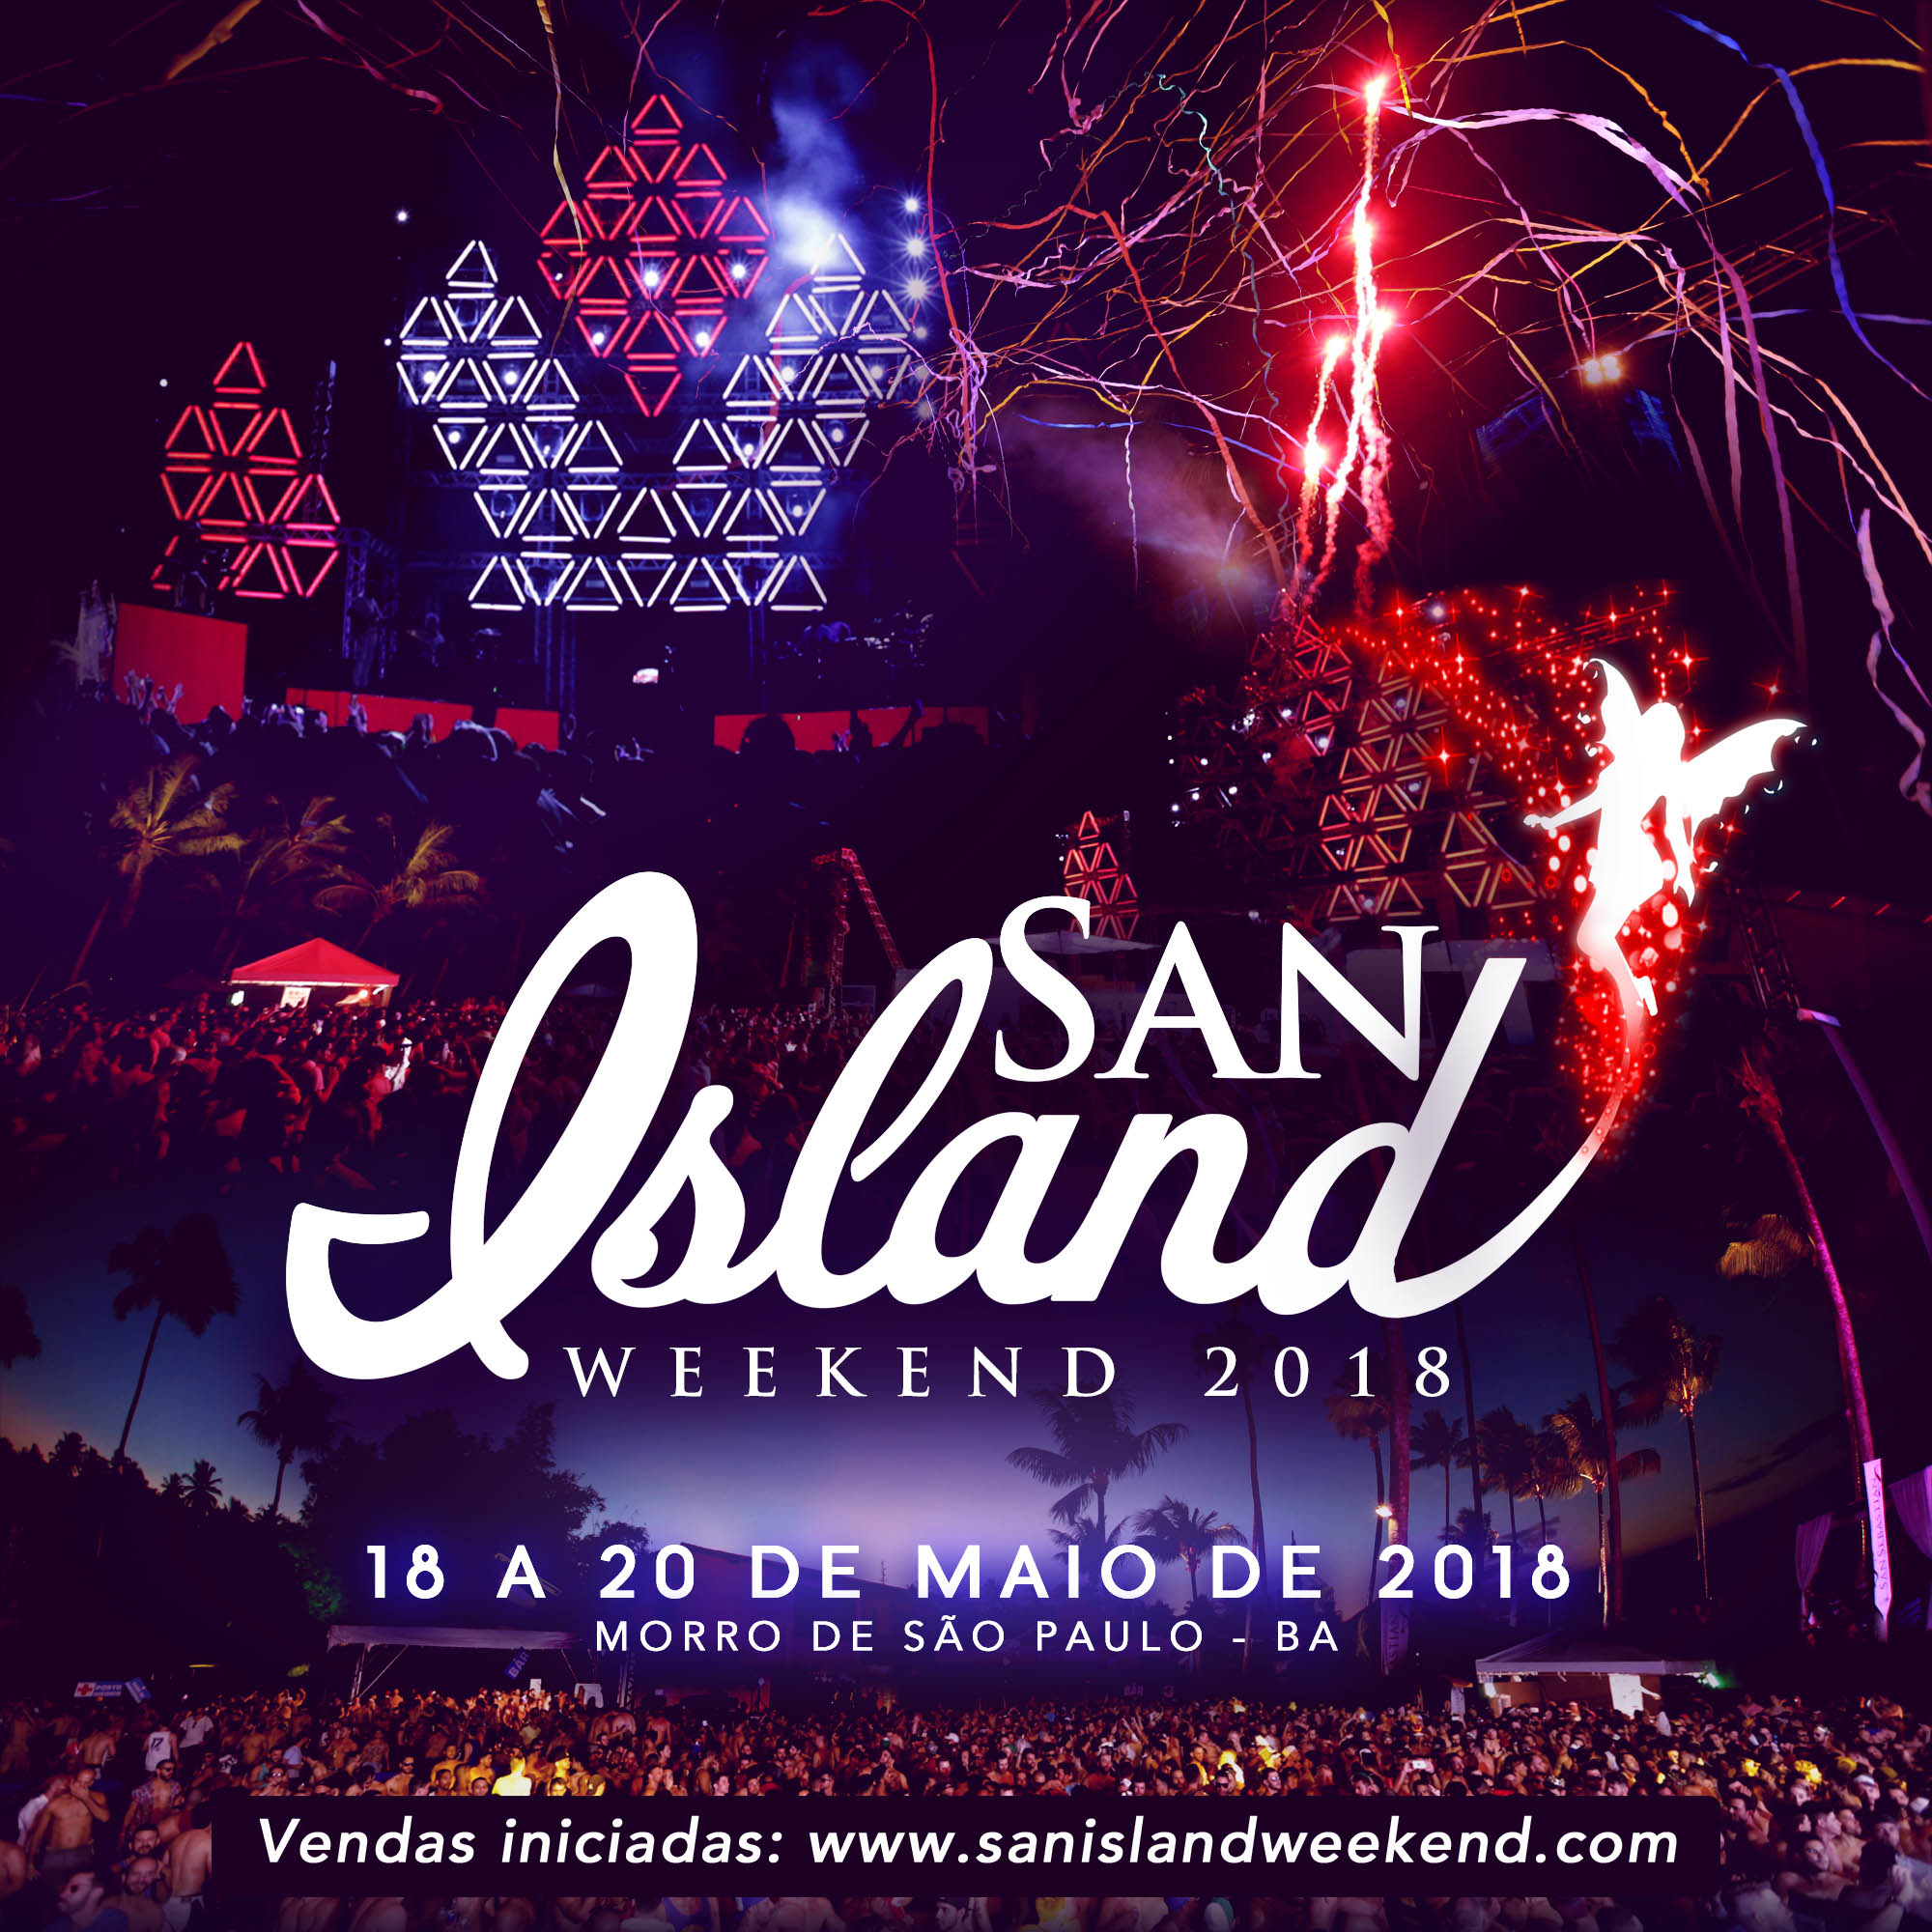 San Island - save the date sem ivete